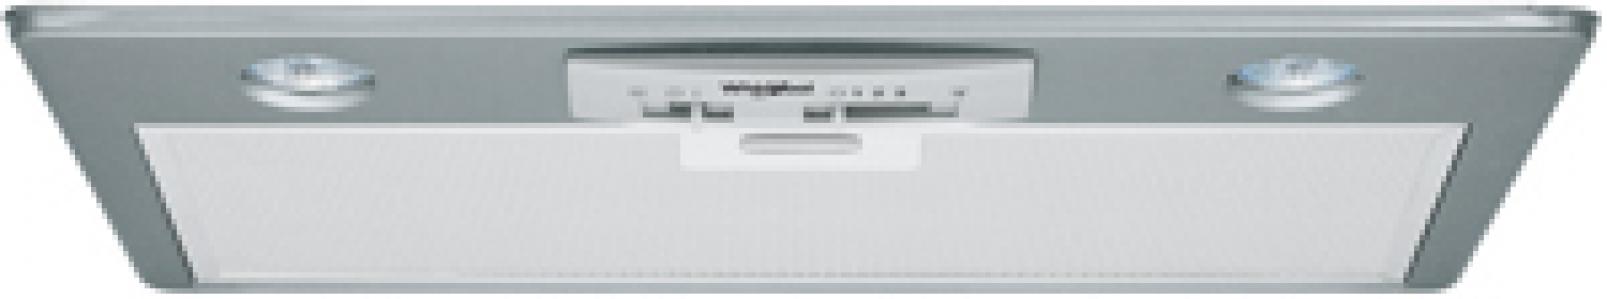 Groupe filtrant  WHIRLPOOL AKR650/1IX